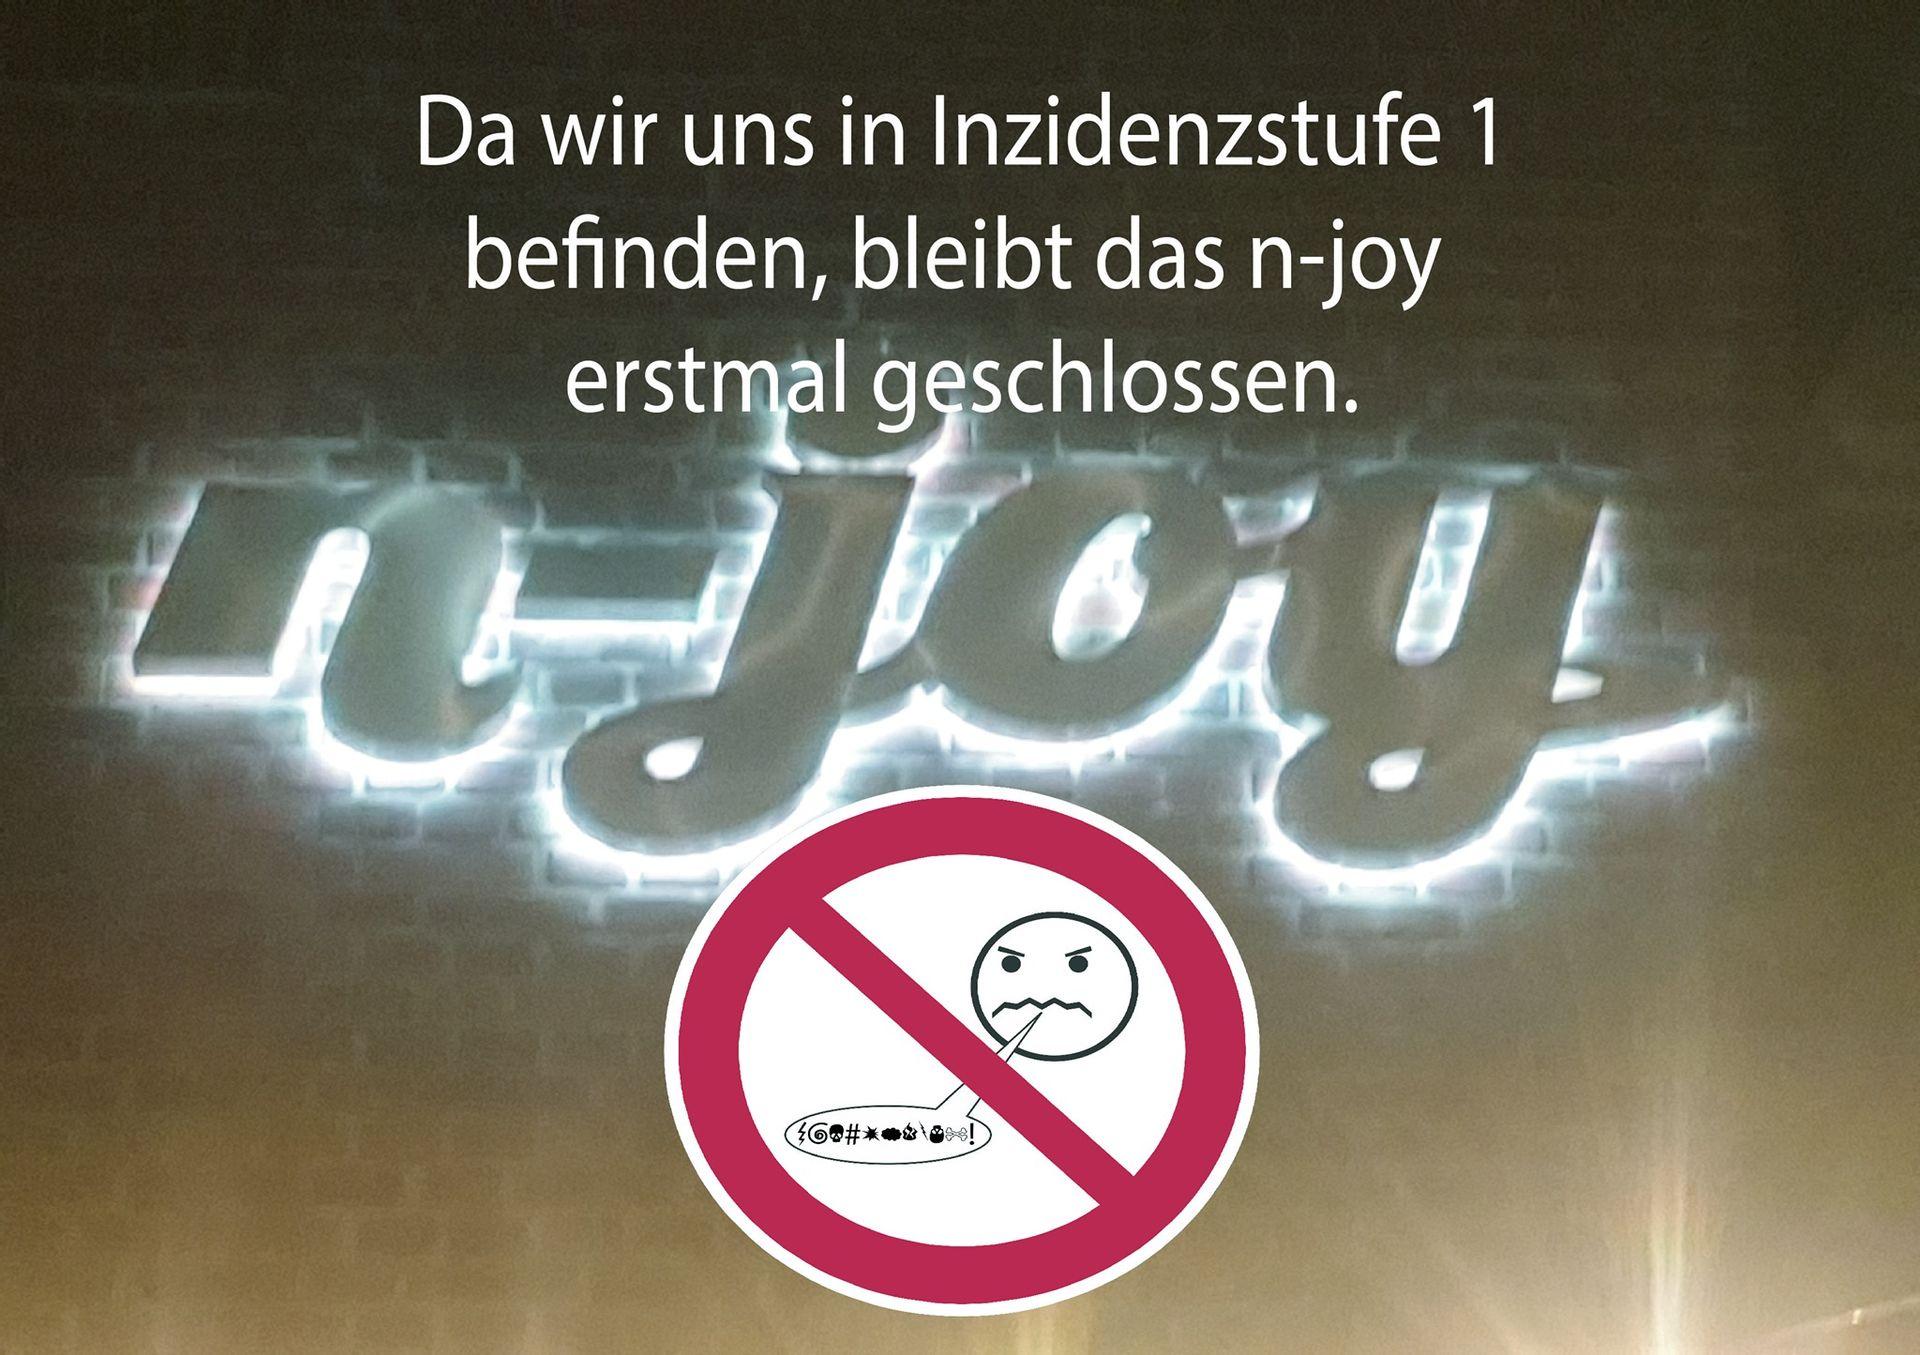 News | N-joy